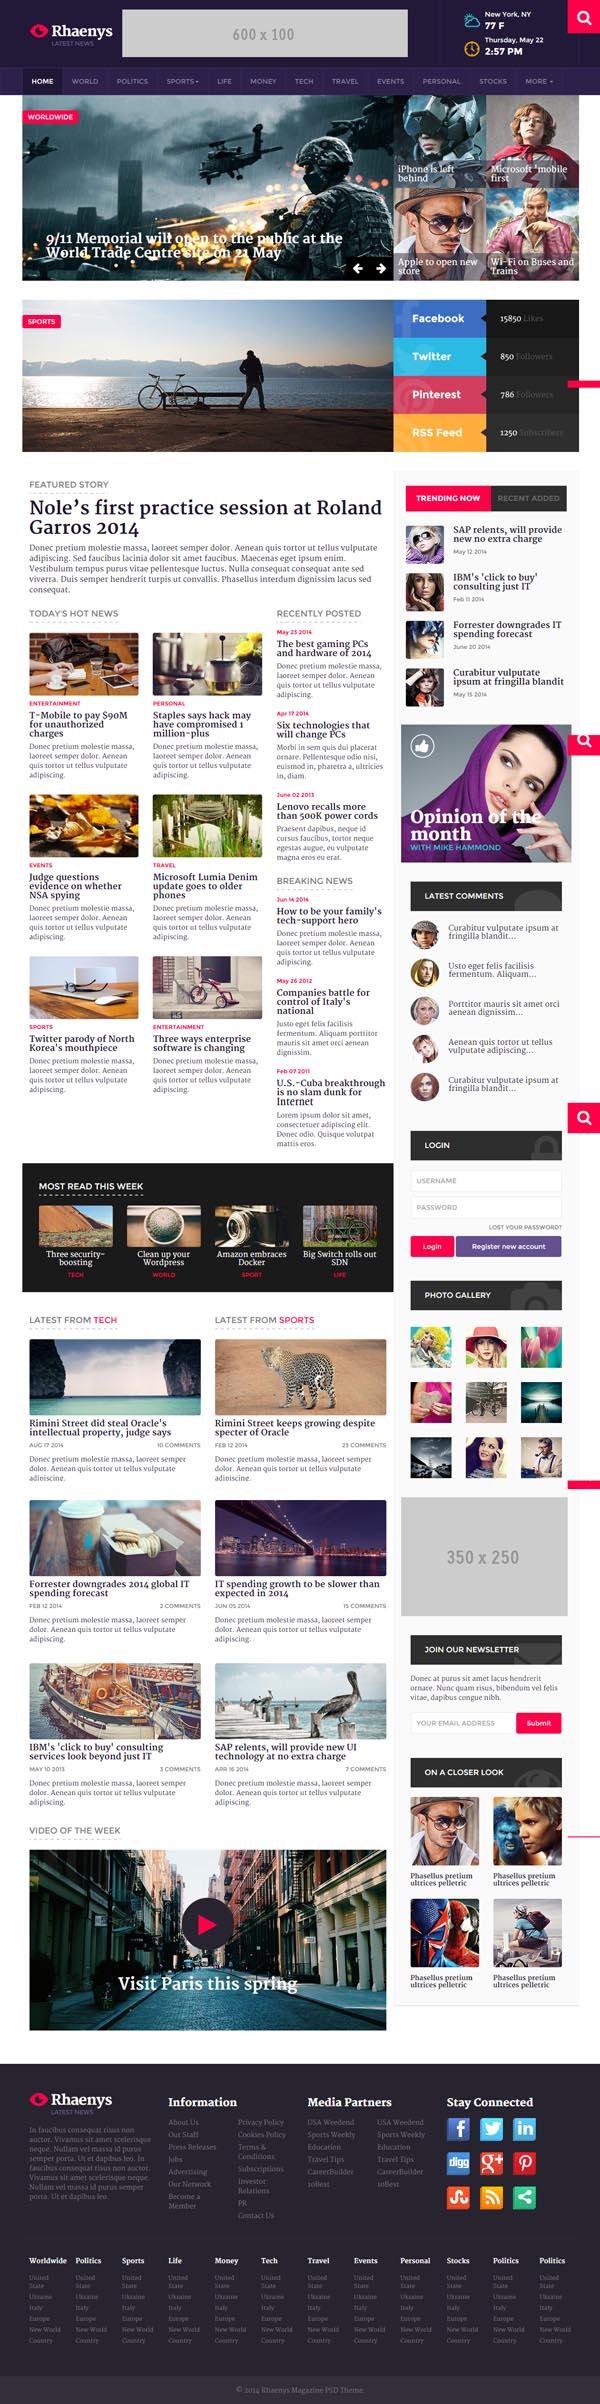 Rhaenys Magazine News Responsive Template Web Design